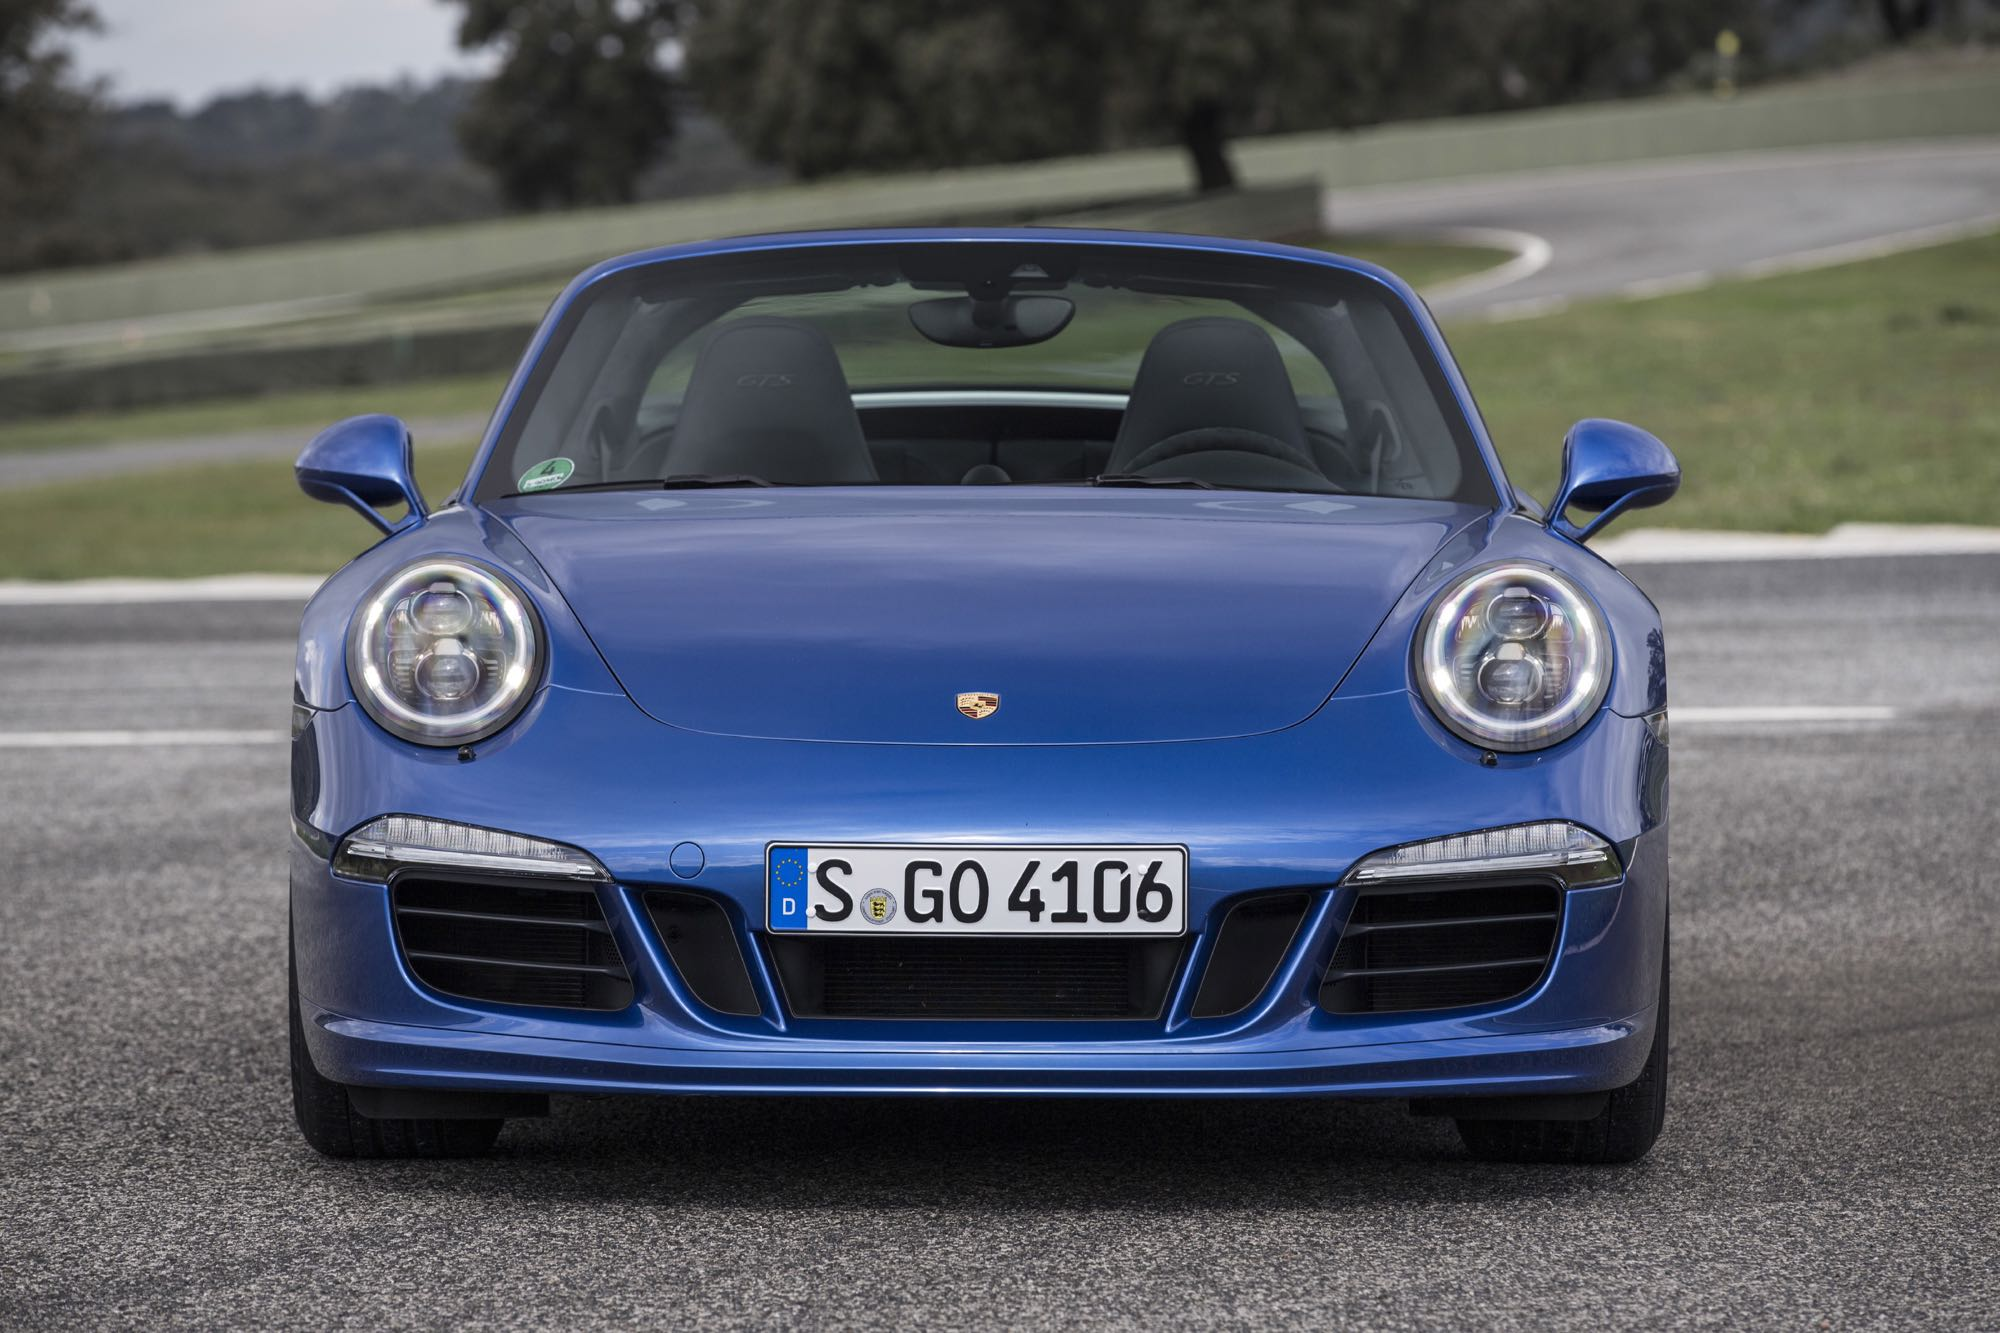 2015 Porsche 911 Targa 4 GTS Review | CarAdvice